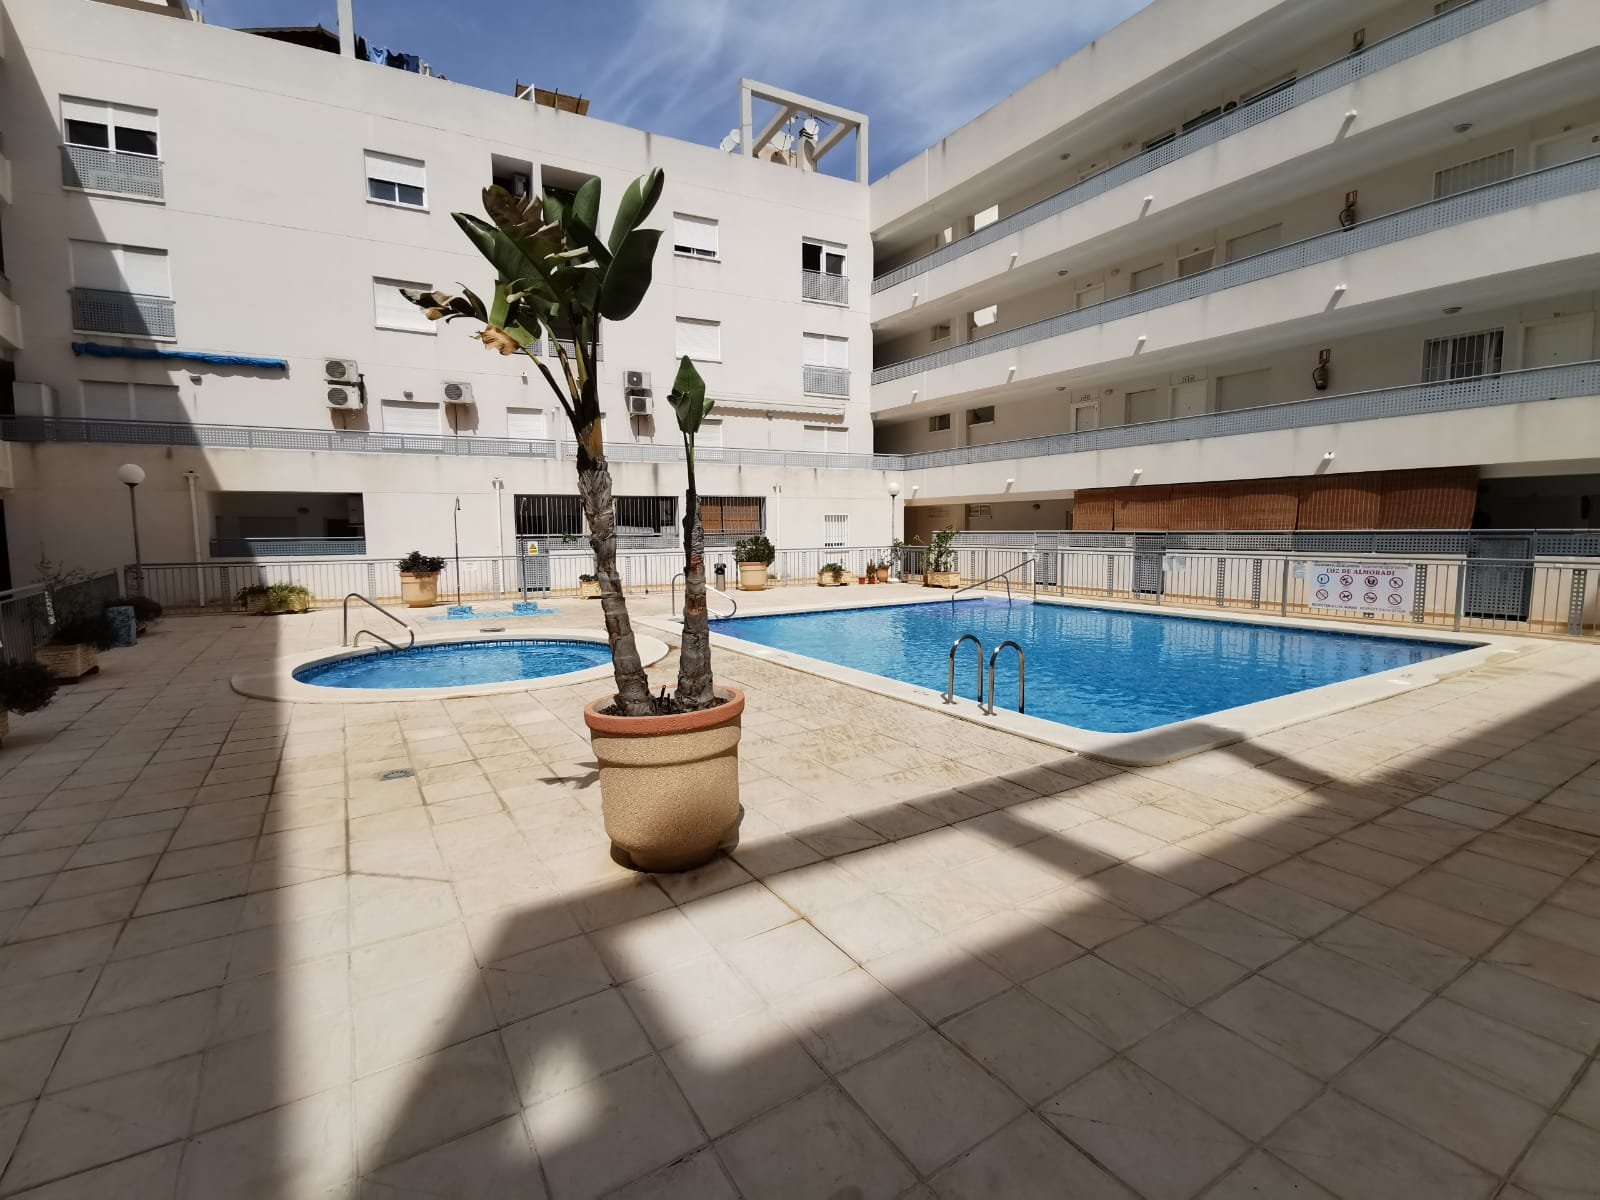 For sale: 2 bedroom apartment / flat in Almoradí, Costa Blanca